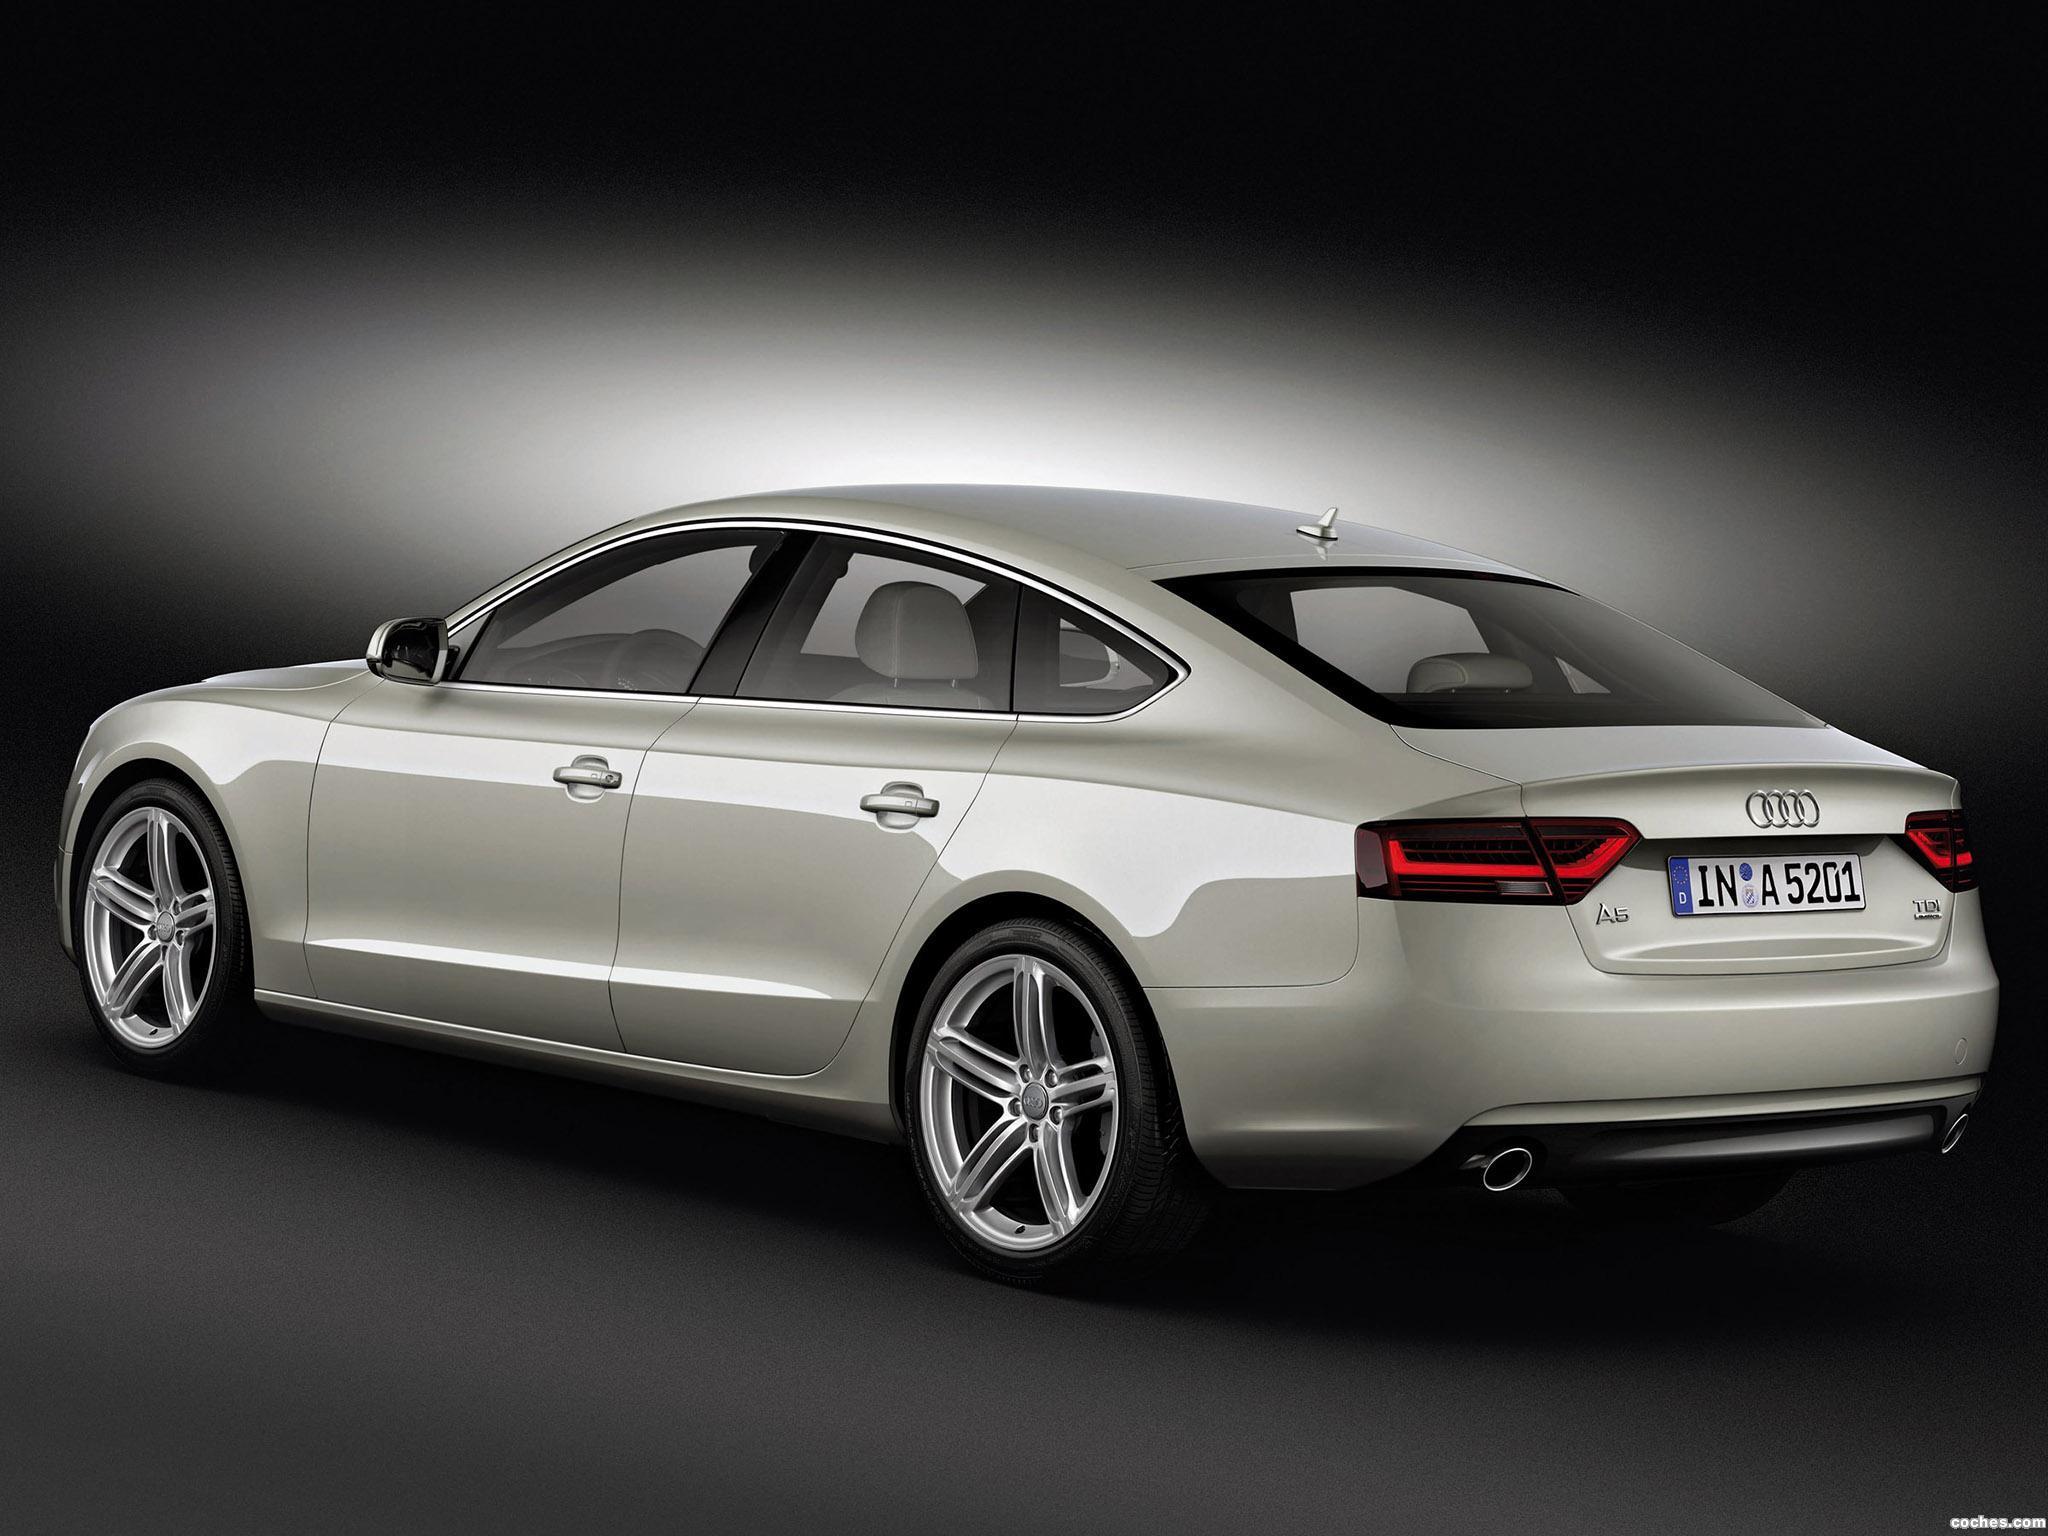 Foto 7 de Audi A5 Sportback 2011